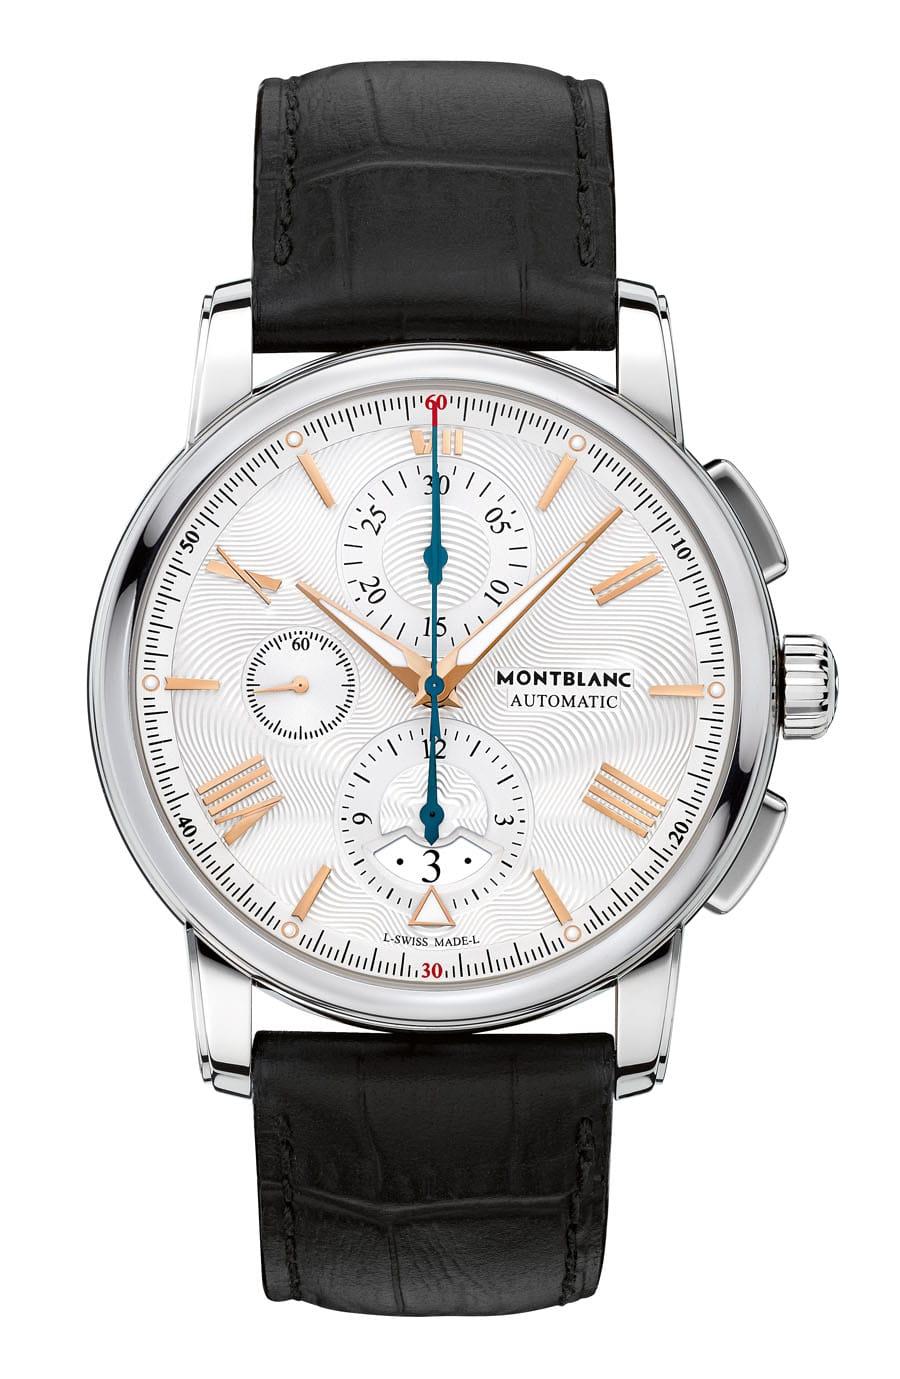 Montblanc: 4810 Chronograph Automatic